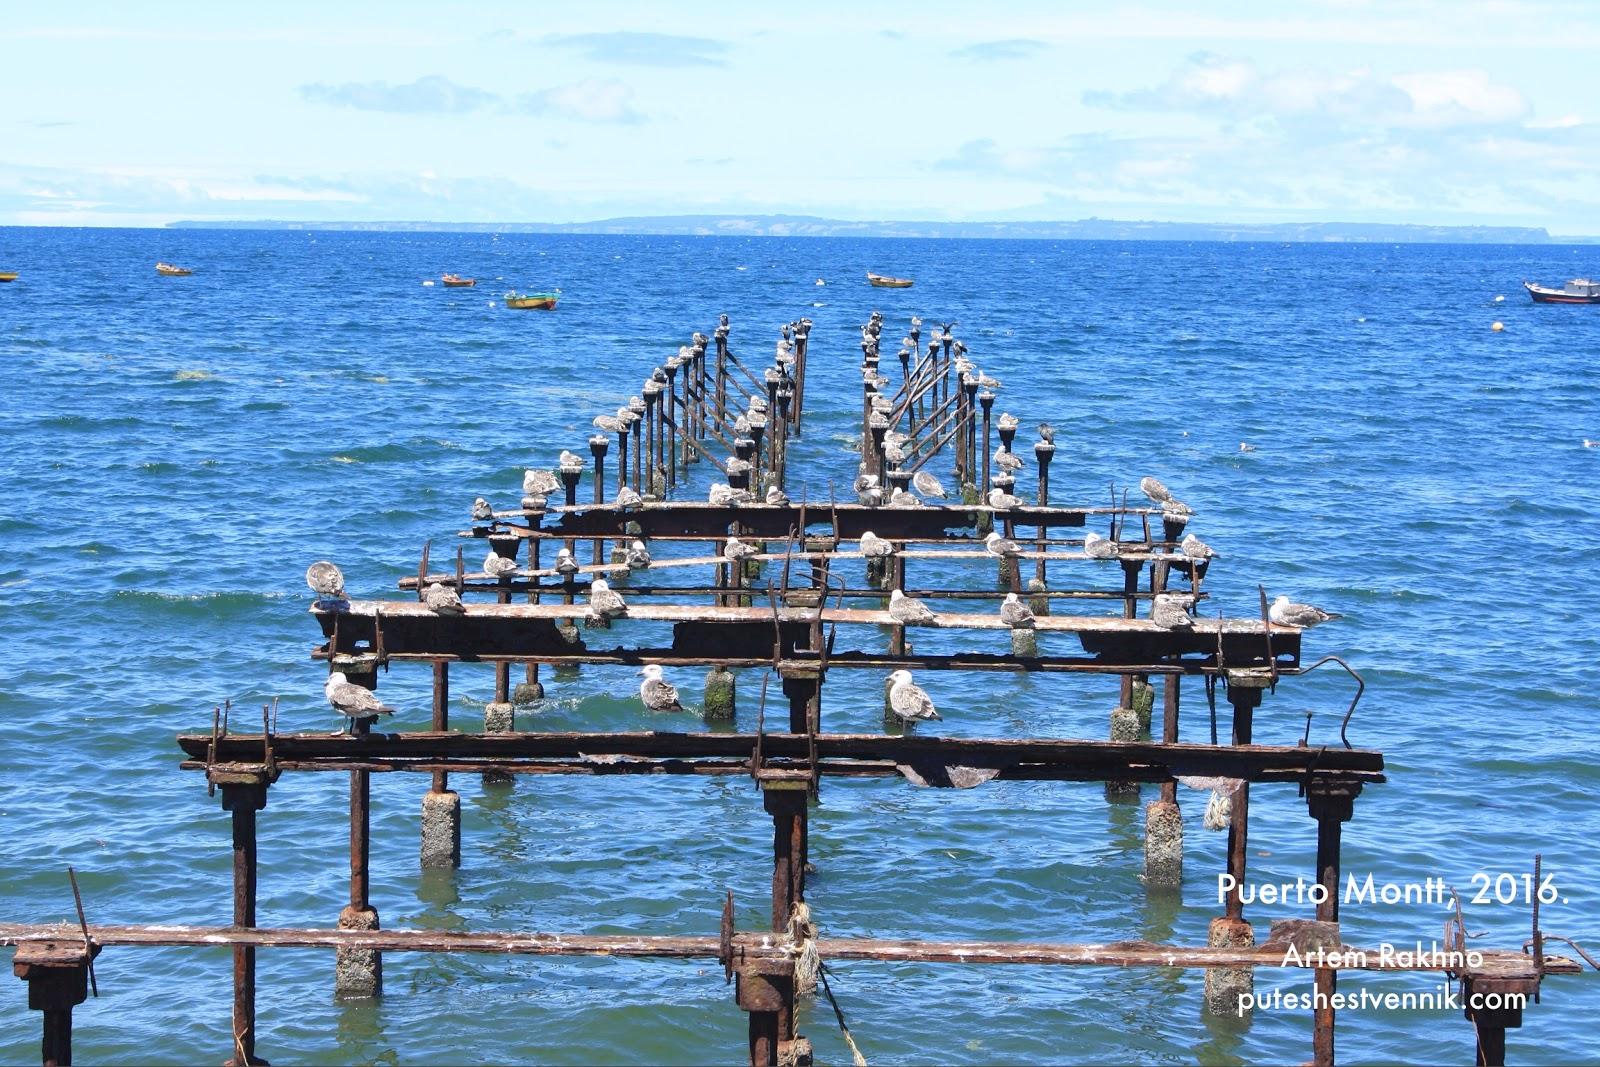 Чайки в Пуэрто-Монт